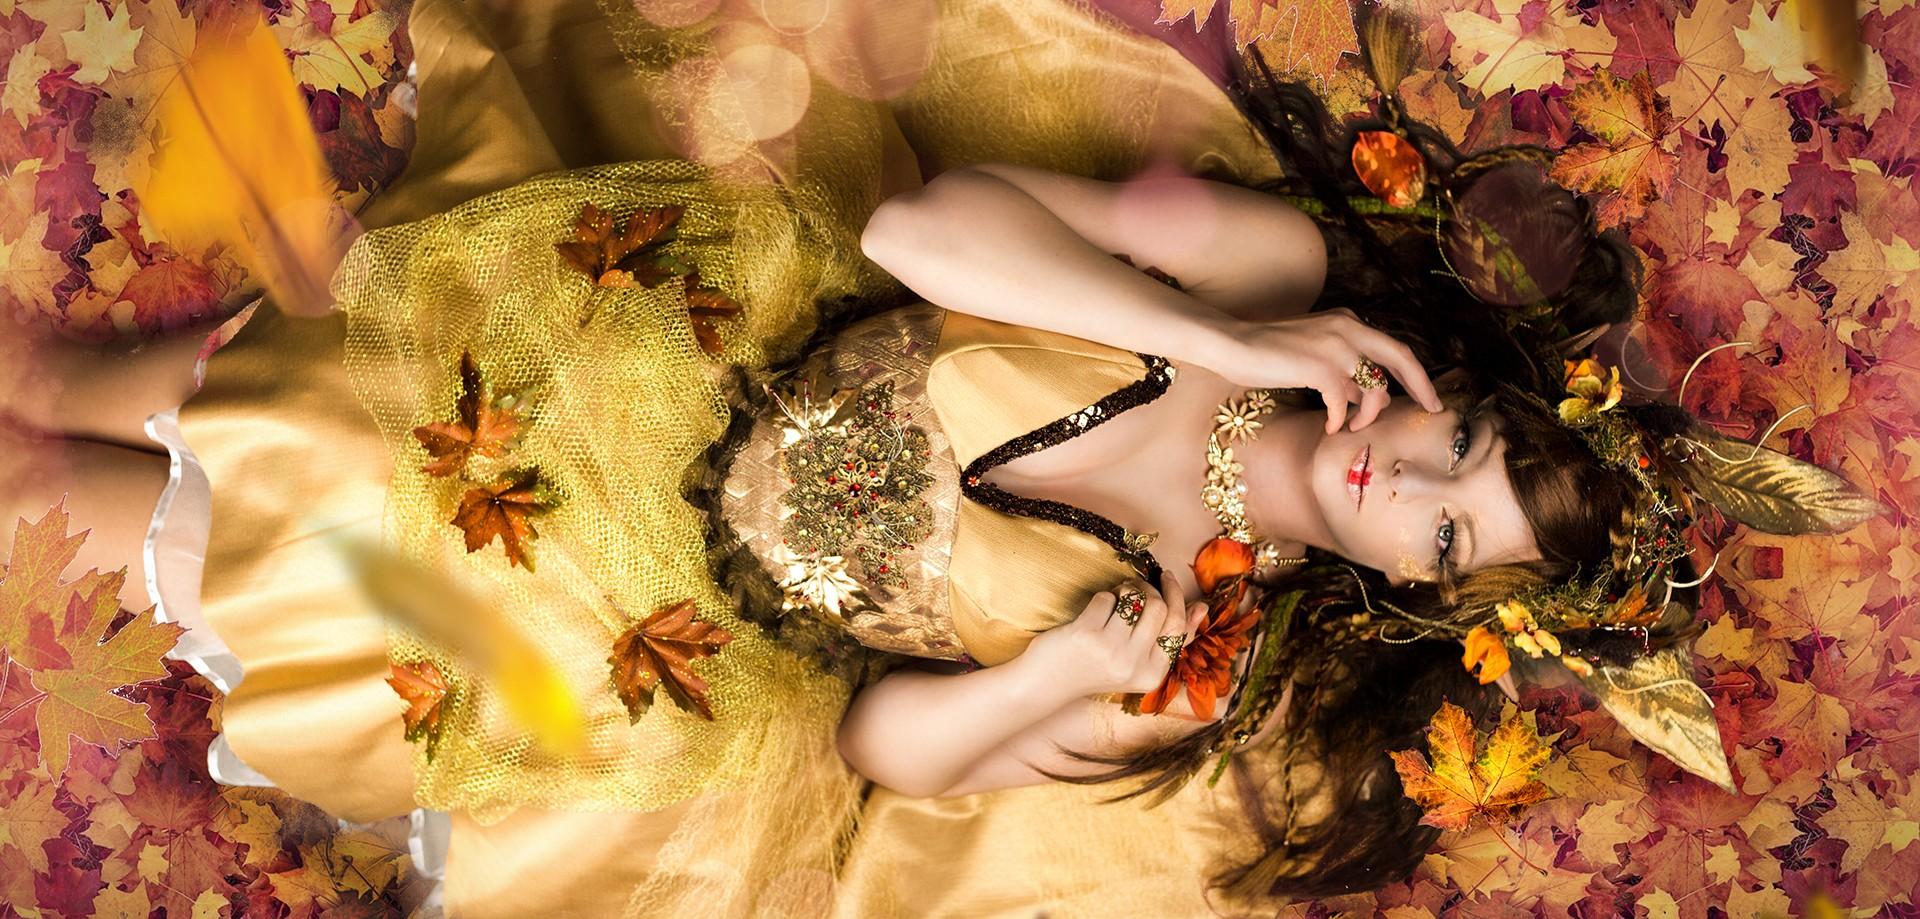 fairy cosplay eden craft